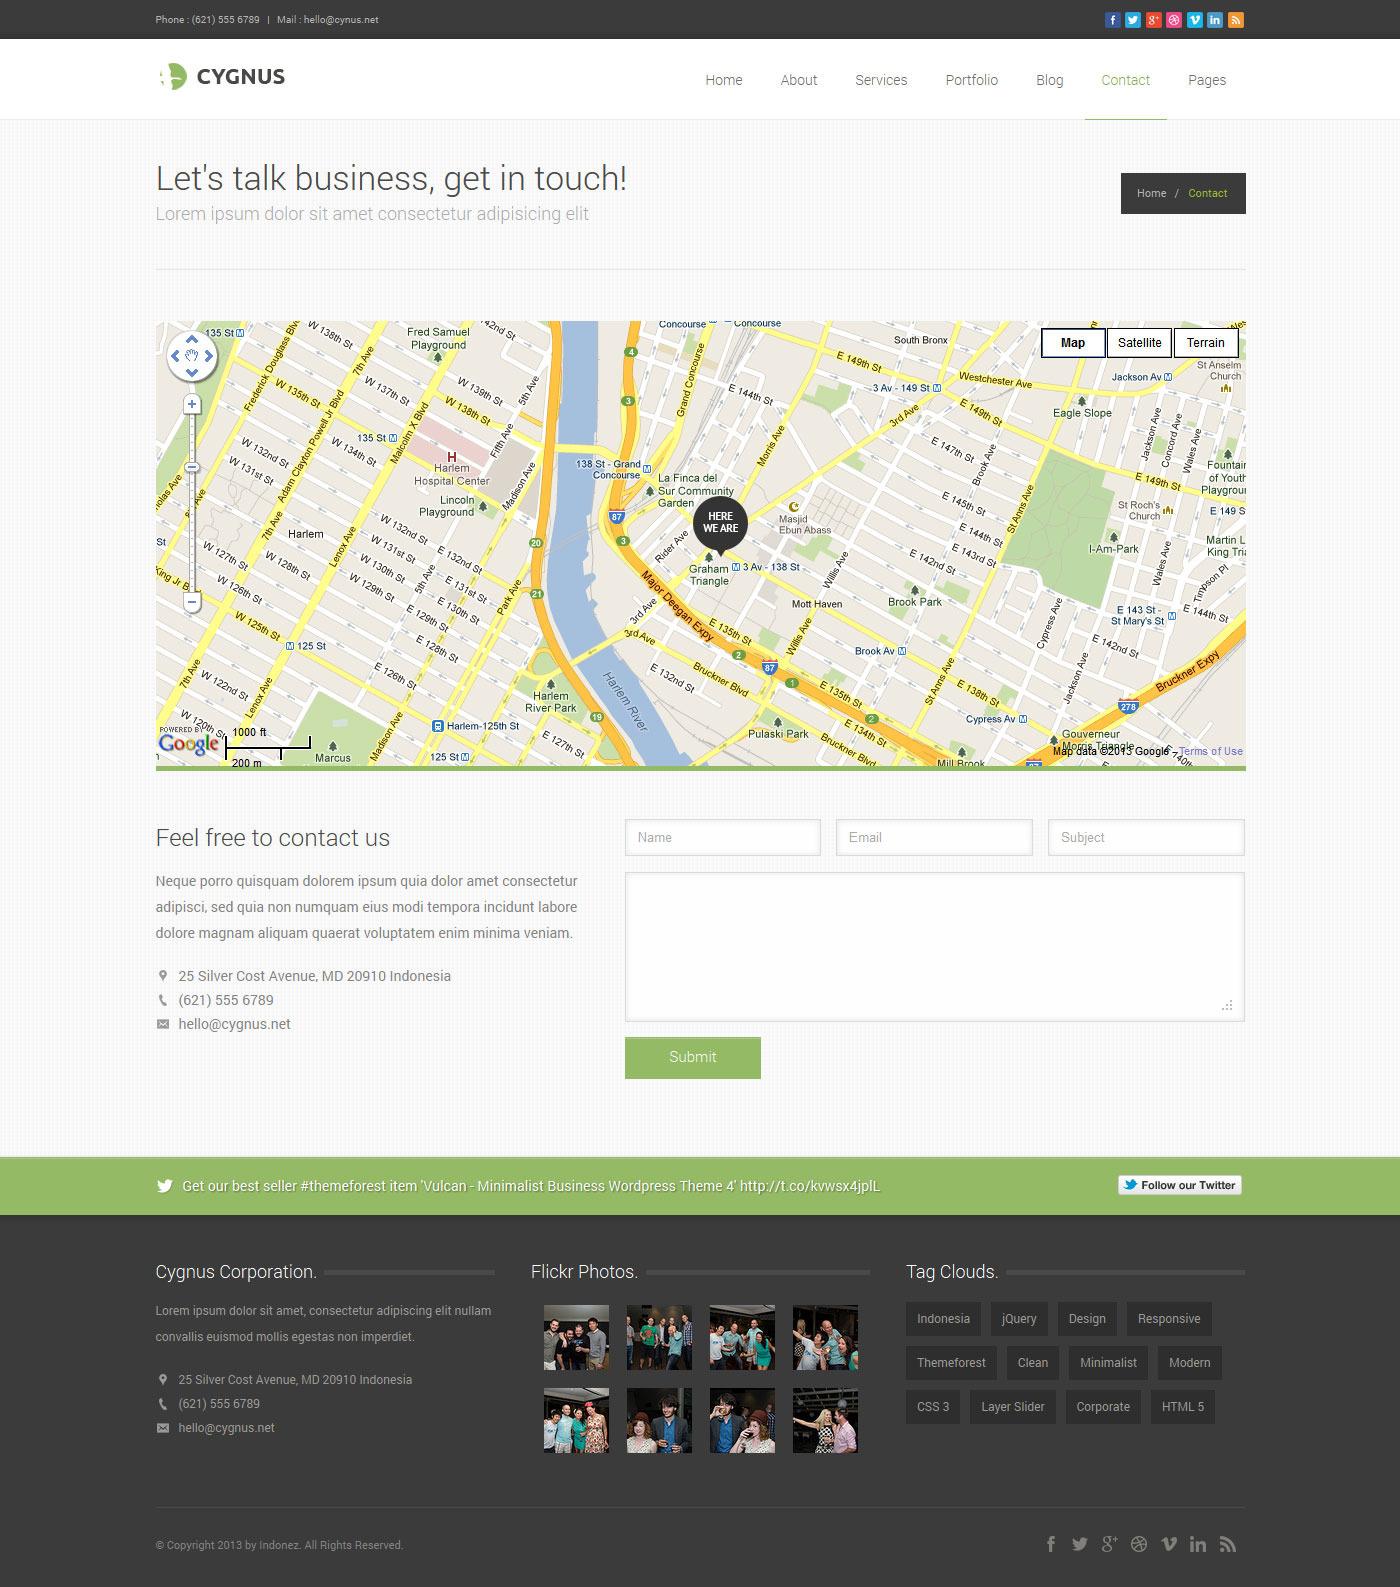 Cygnus - Minimalist Business Wordpress Theme 8